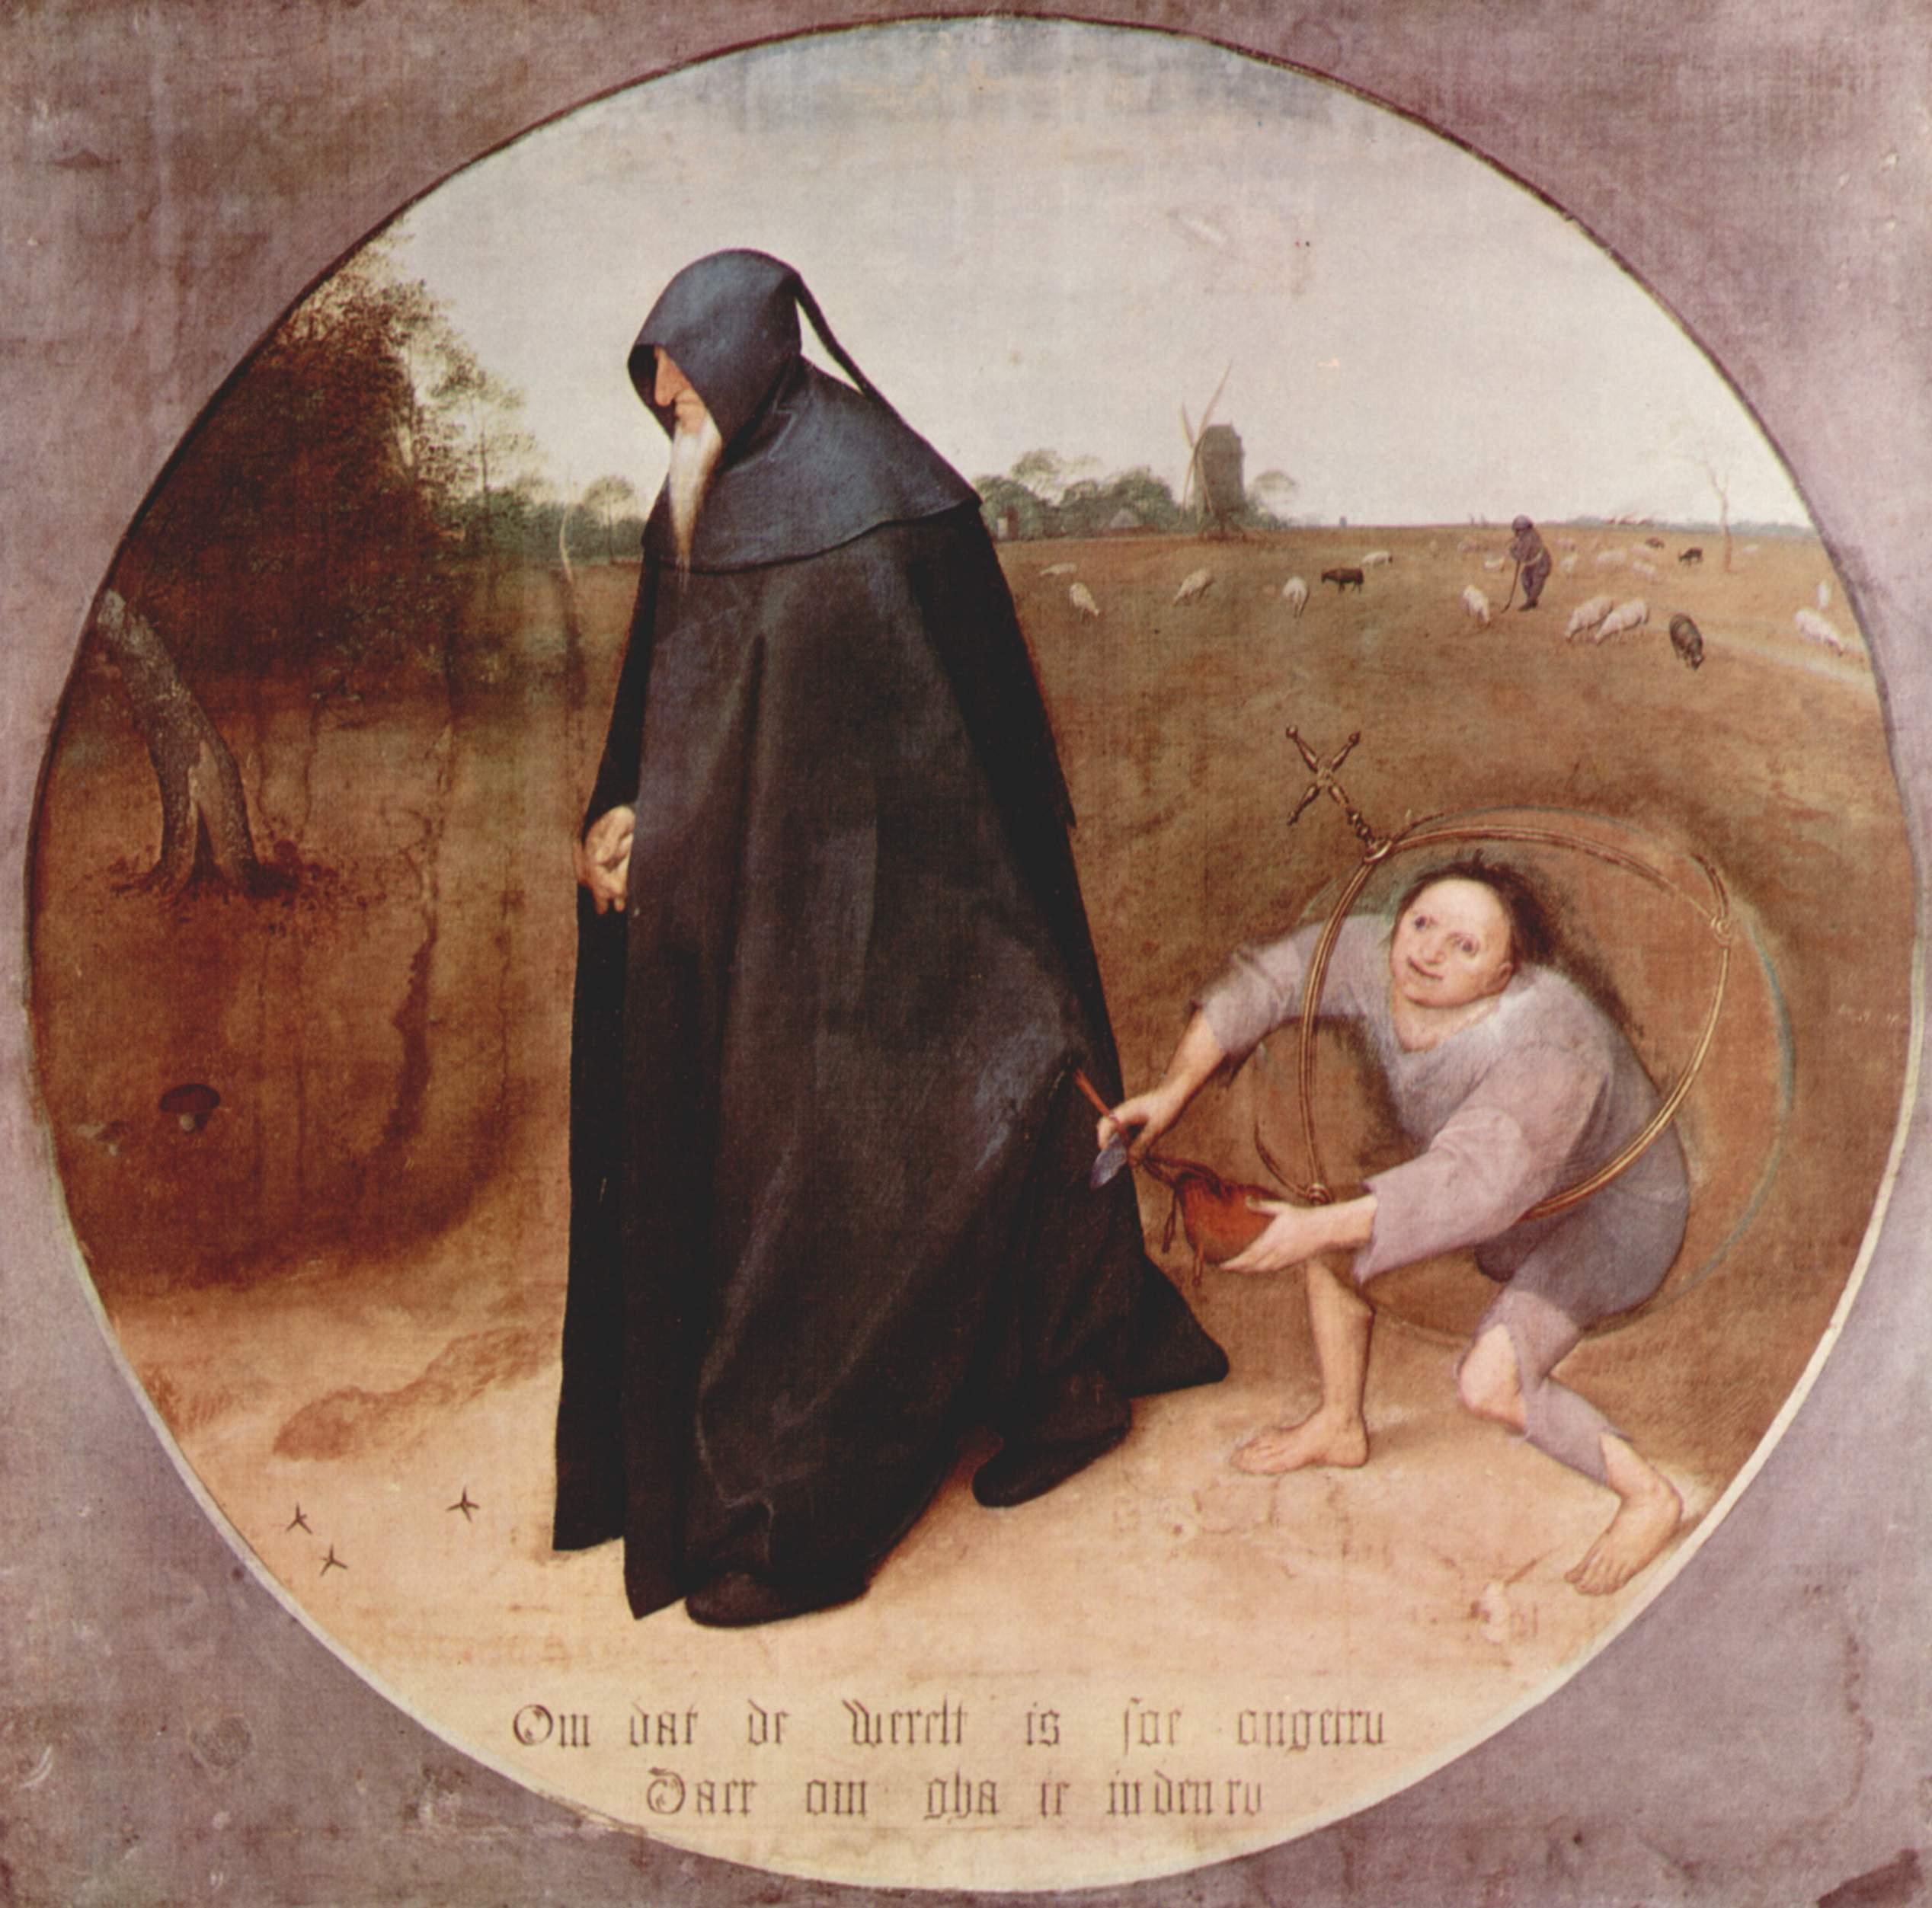 http://upload.wikimedia.org/wikipedia/commons/8/8f/Pieter_Bruegel_d._%C3%84._035.jpg